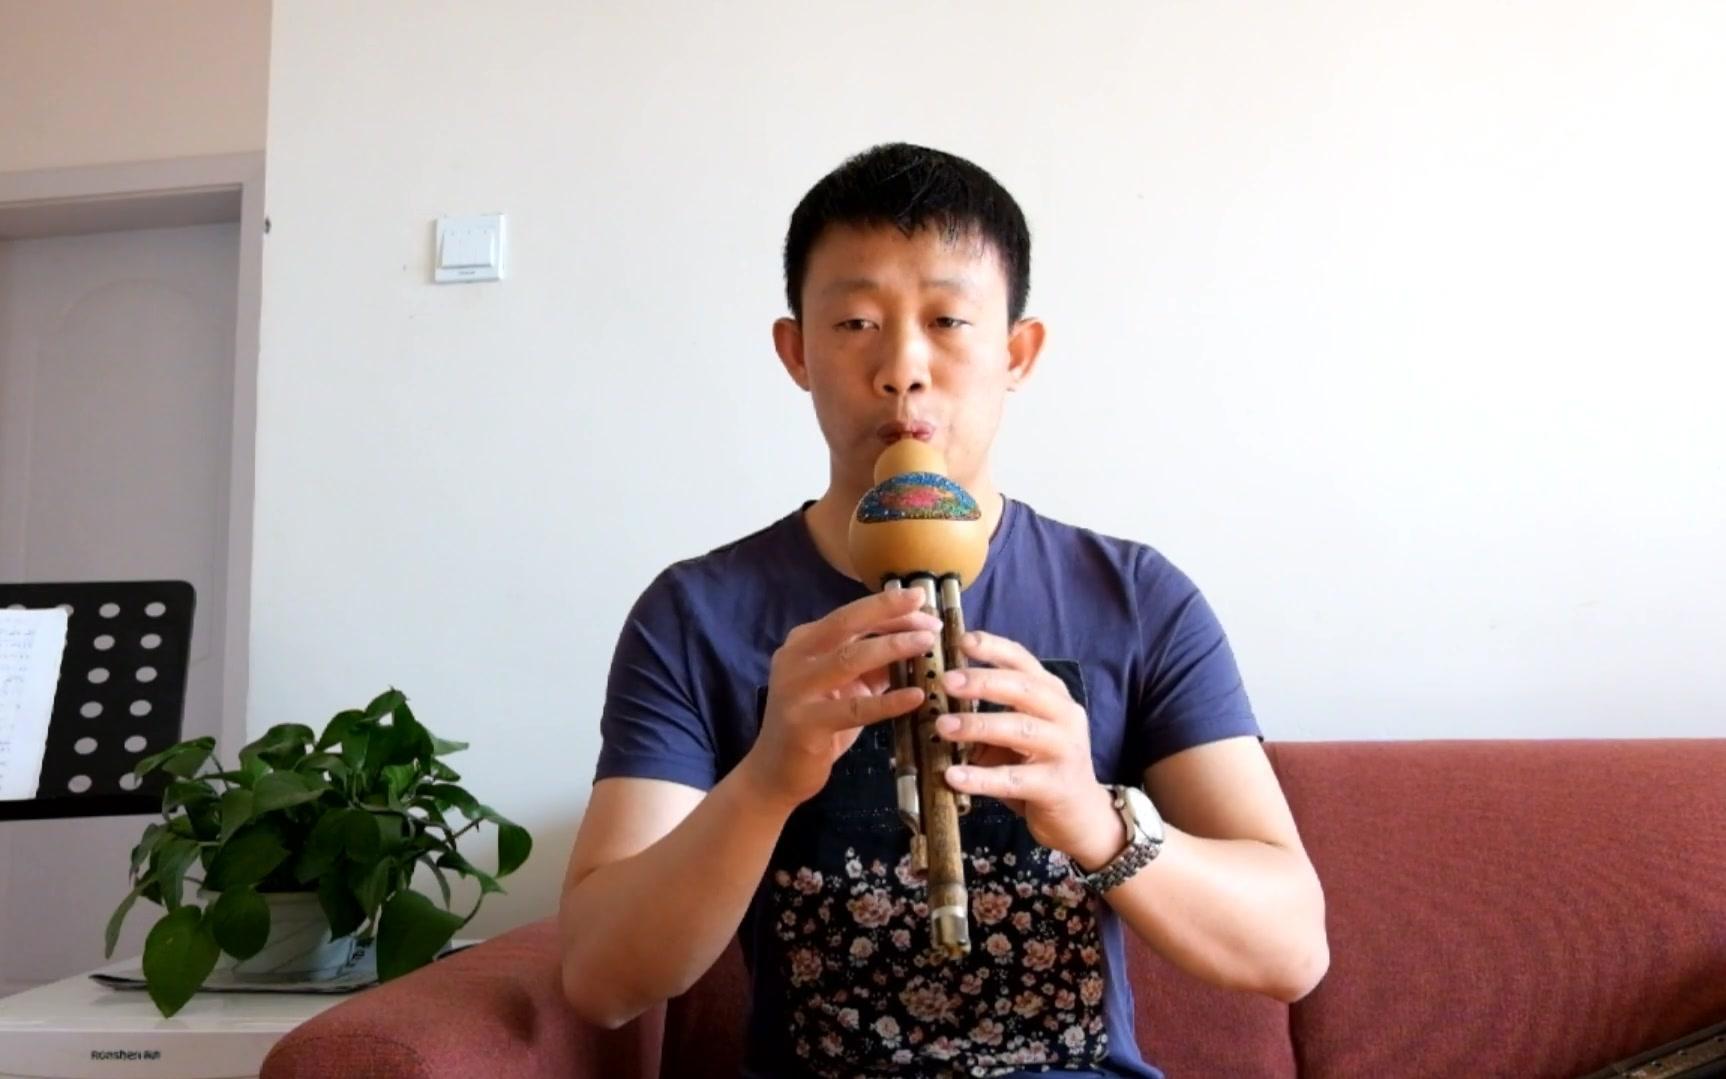 6621音乐_葫芦丝 月光下的凤尾竹 C调F调_哔哩哔哩 (゜-゜)つロ 干杯~-bilibili